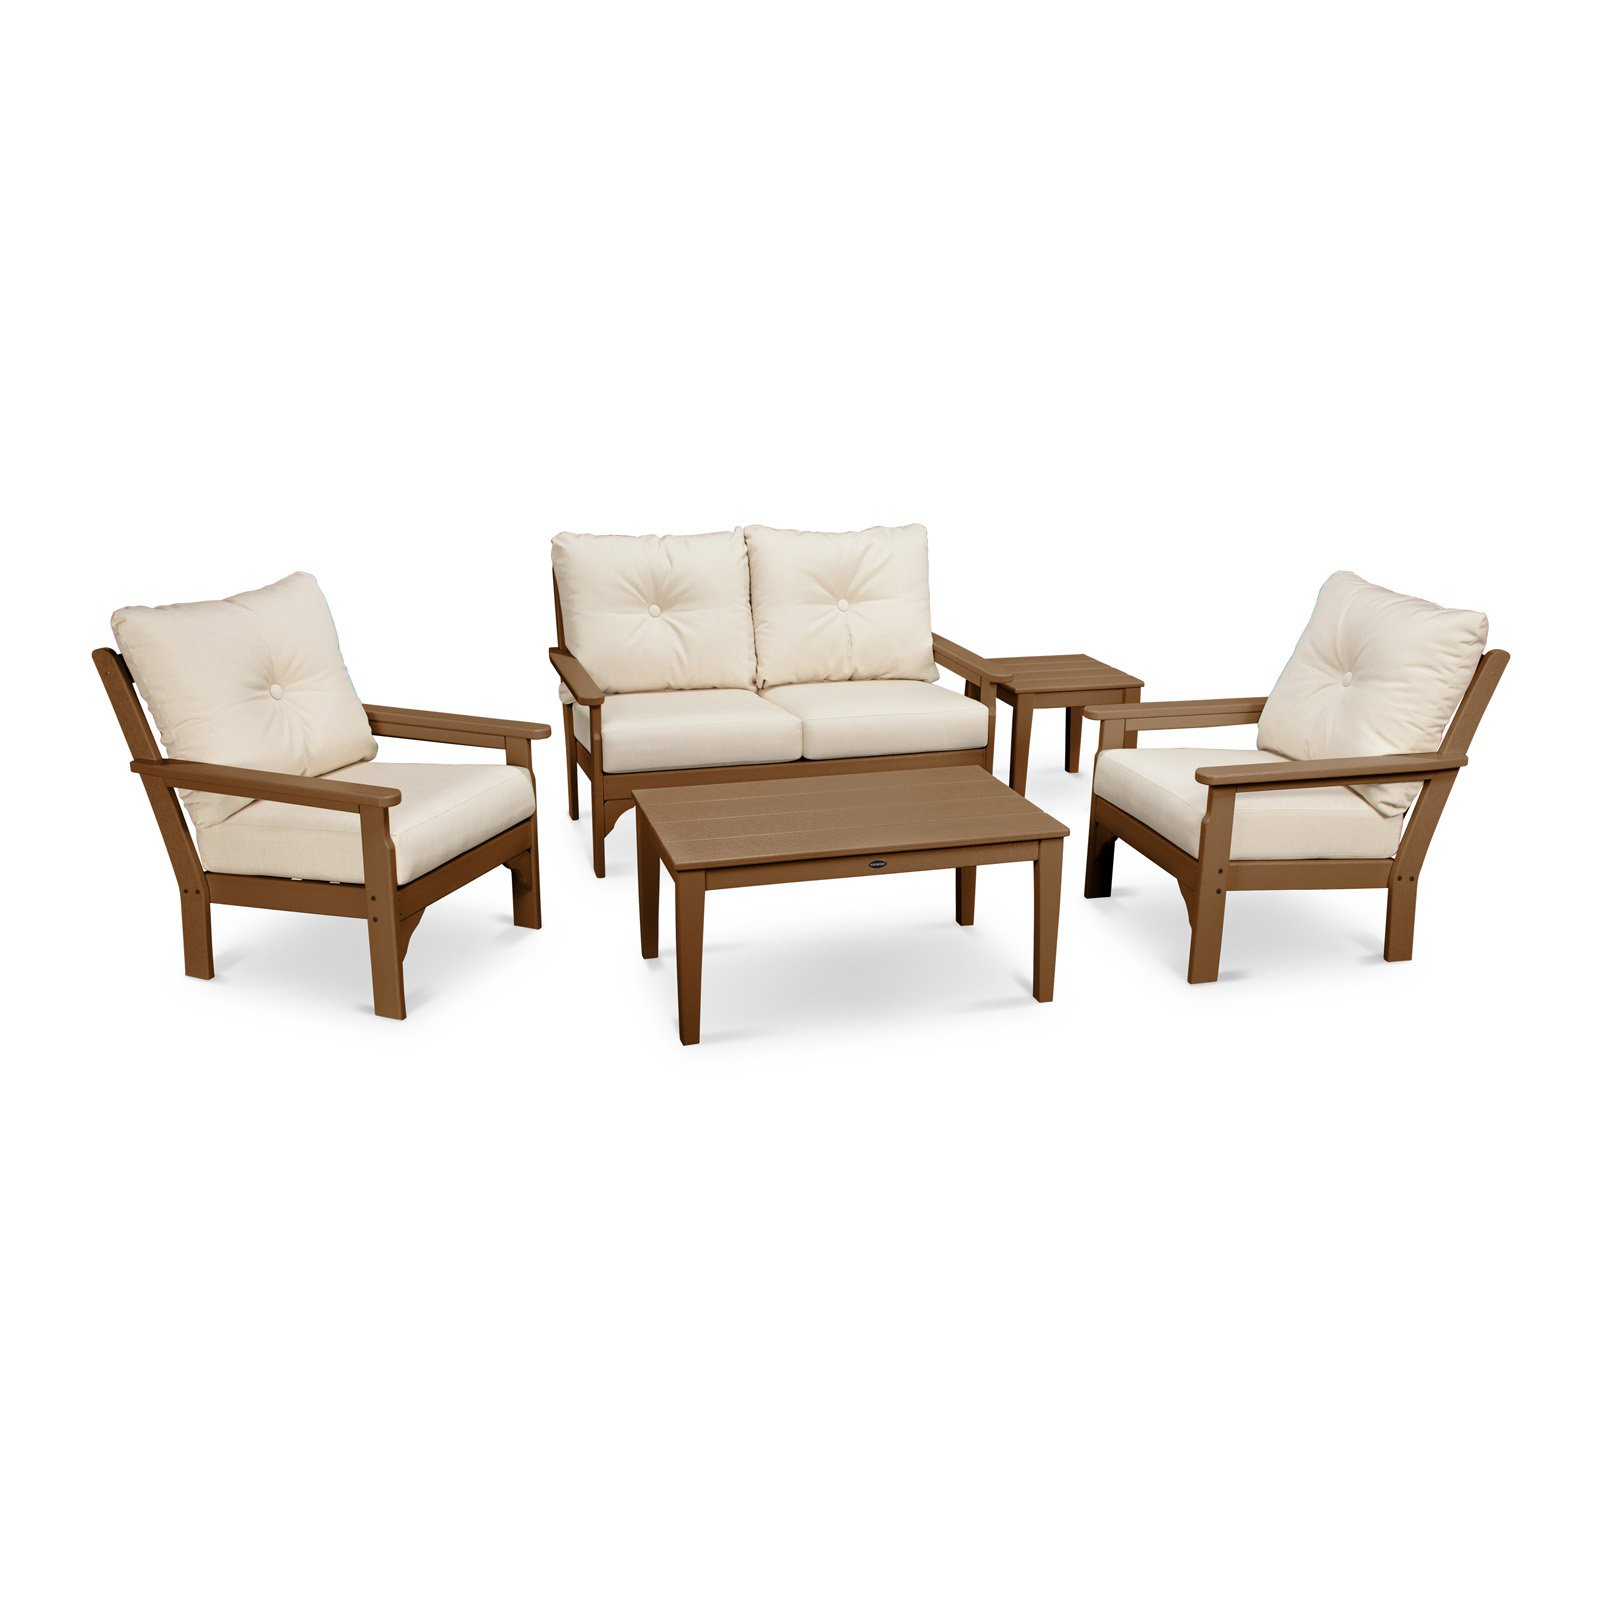 Outdoor PolywoodVineyard High Density Polyethylene 5 Piece Deep Seating Patio Conversation Set